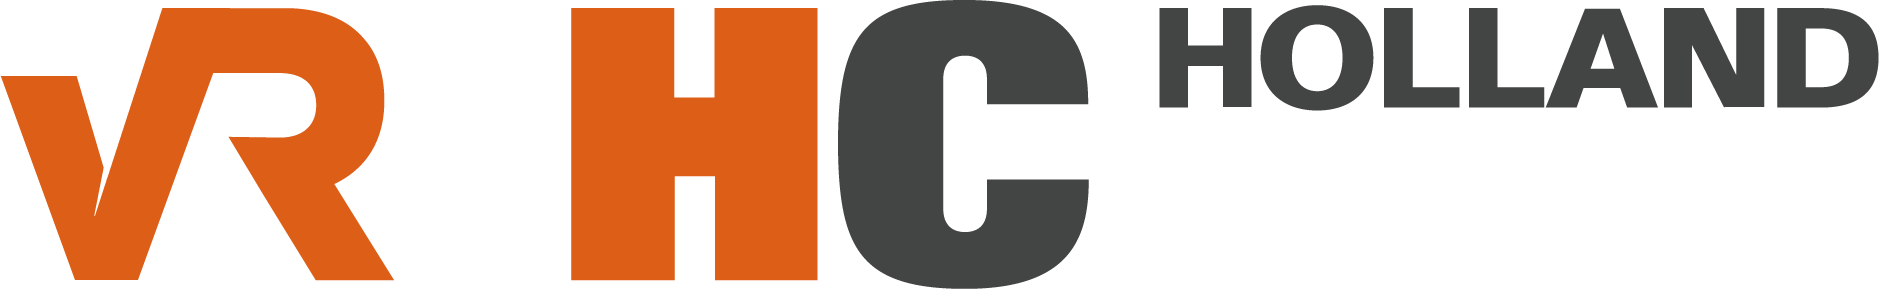 hcholland logo